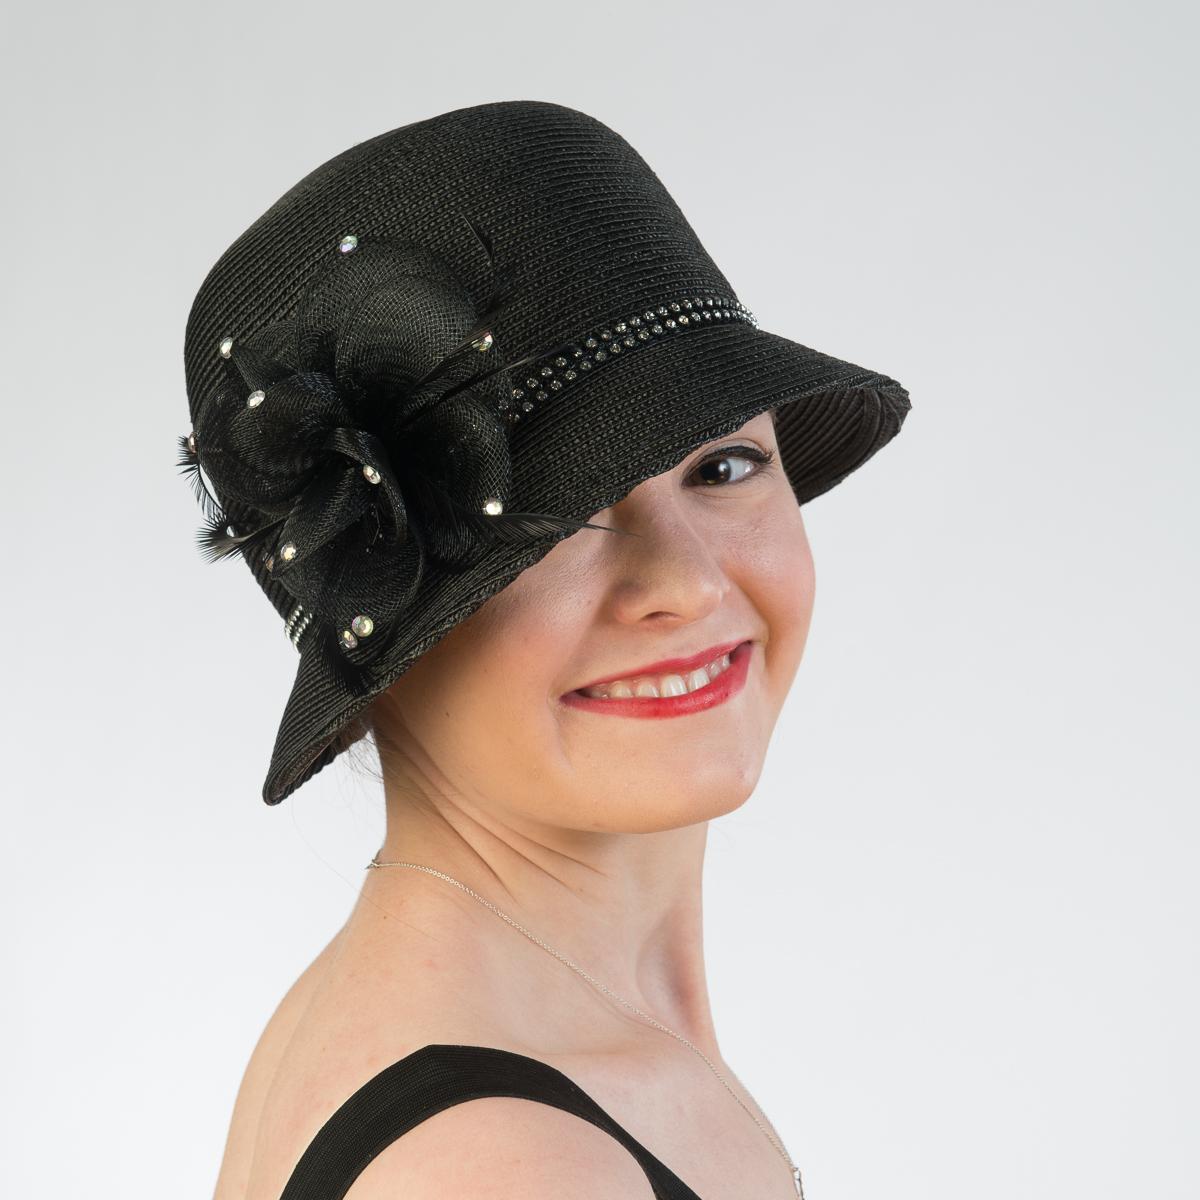 a4359497917d0 Black Rhinestone Band Crinoline Bow Cloche Hats-301767-BK- Sun Yorkos